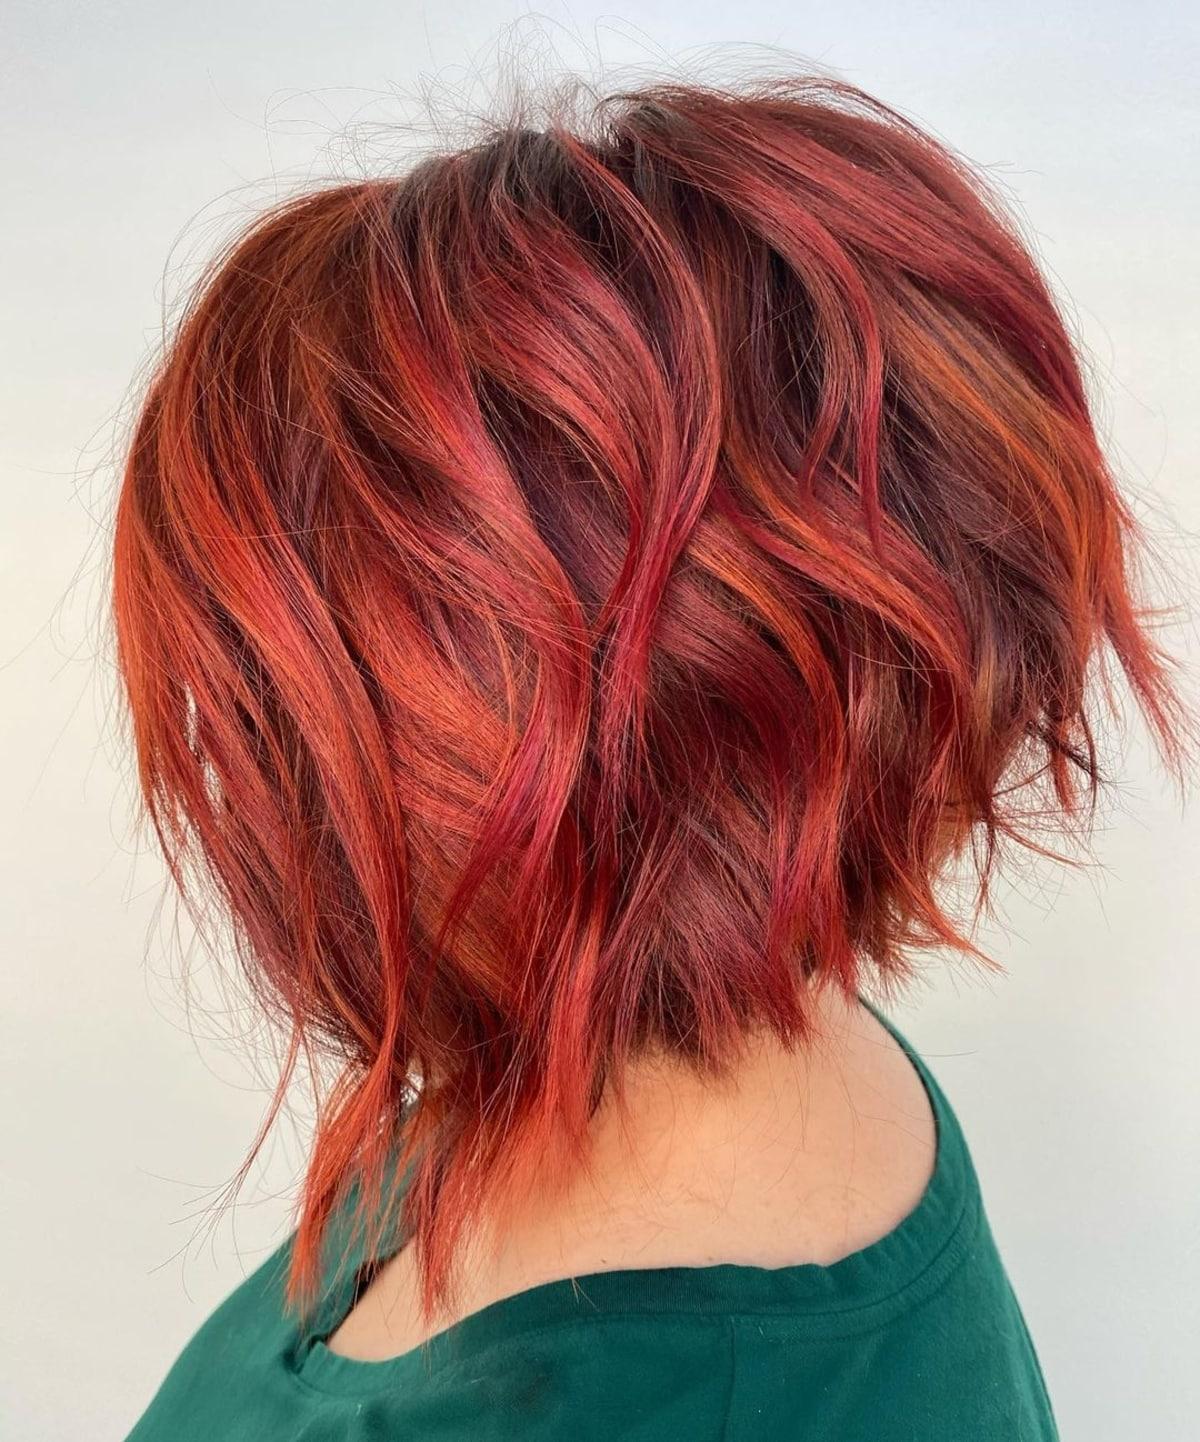 24 Examples of Short Asymmetrical Bob Haircuts for Women